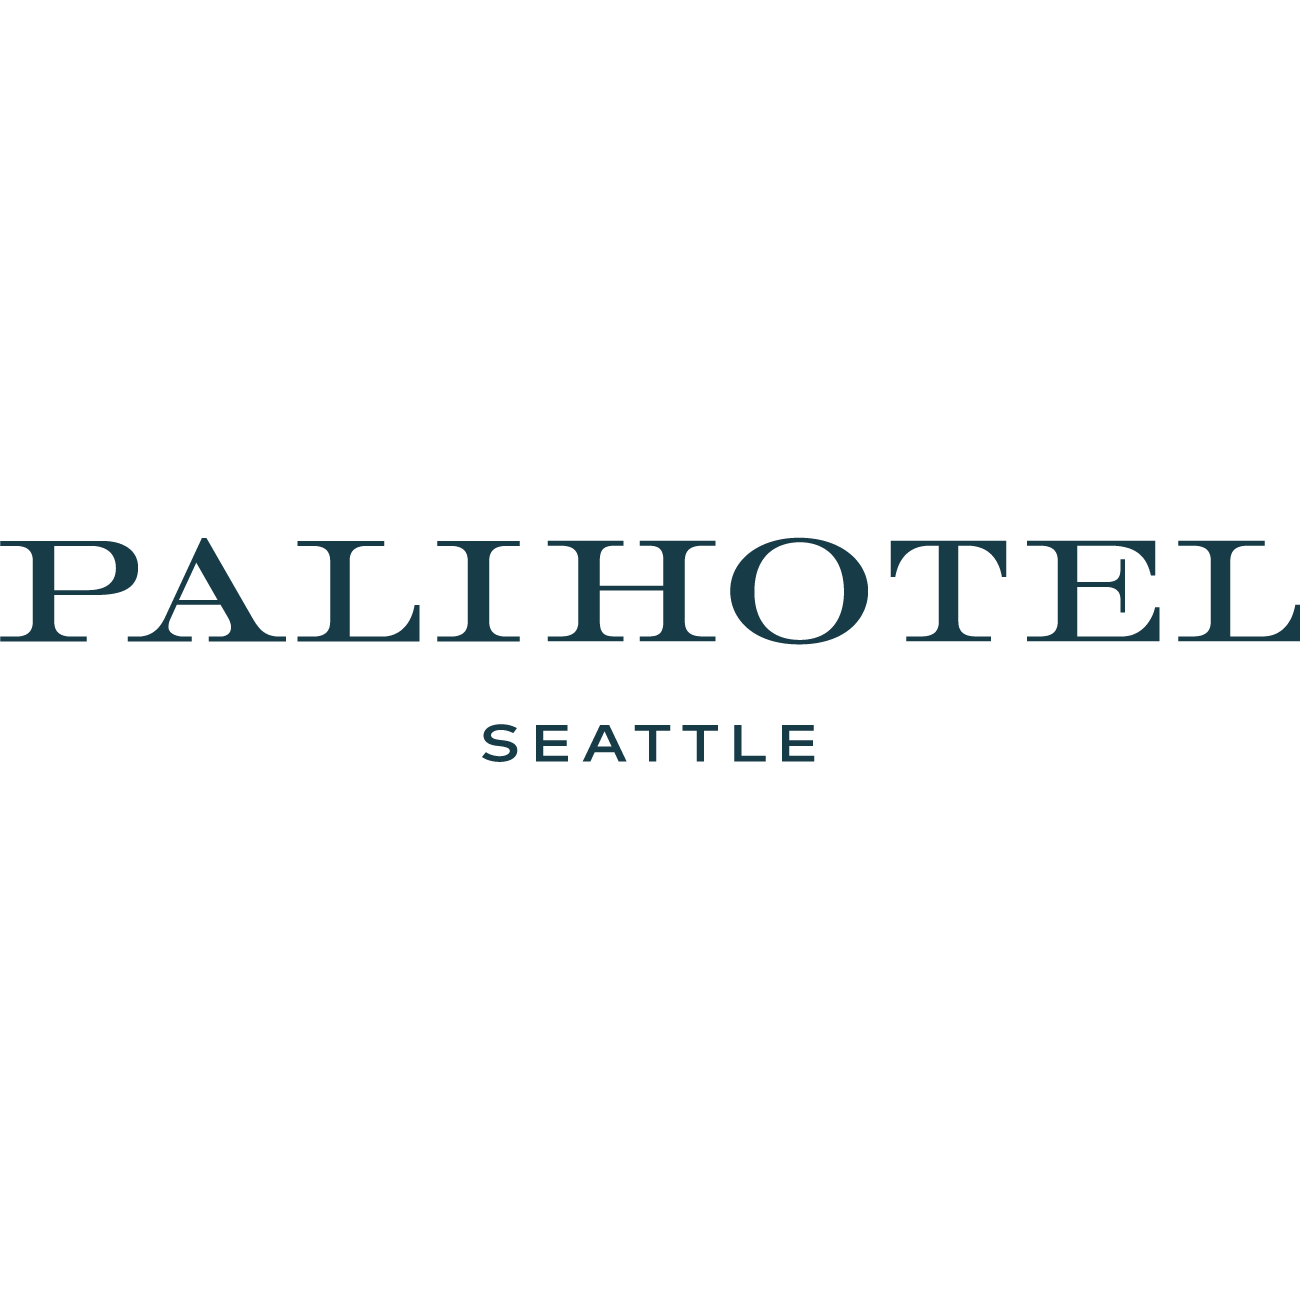 Palihotel Seattle